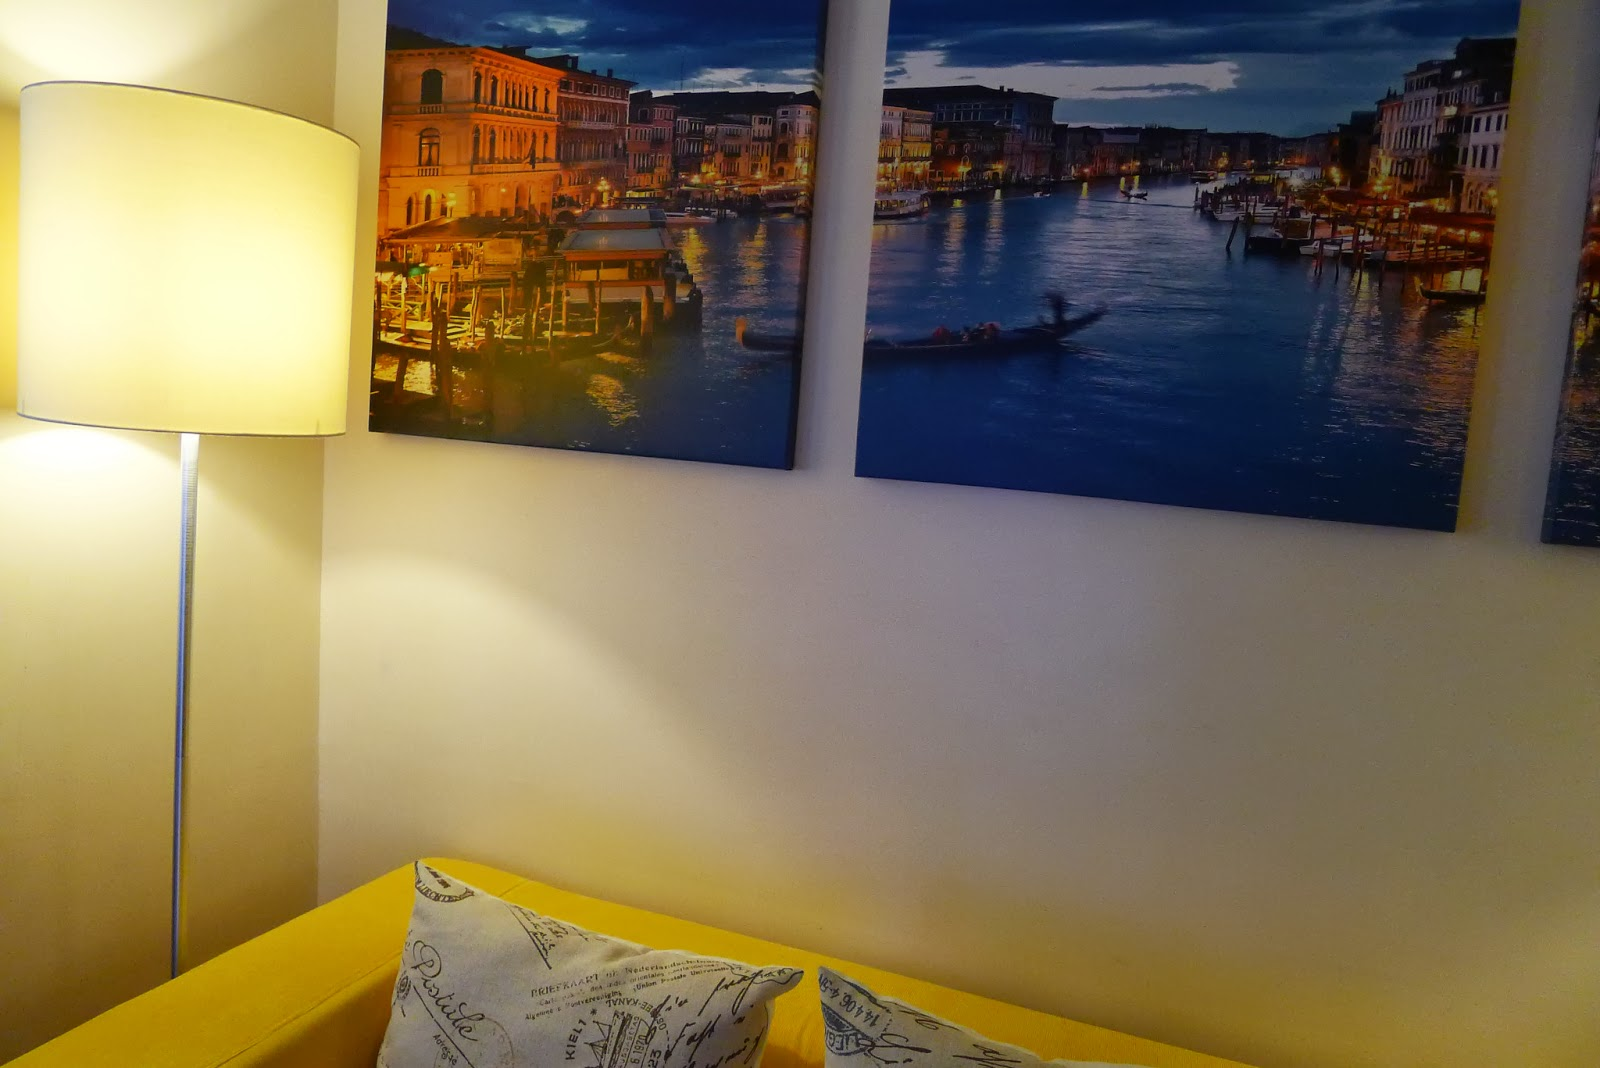 The classic klippan sofa by ikea tina villa for Ikea klippan